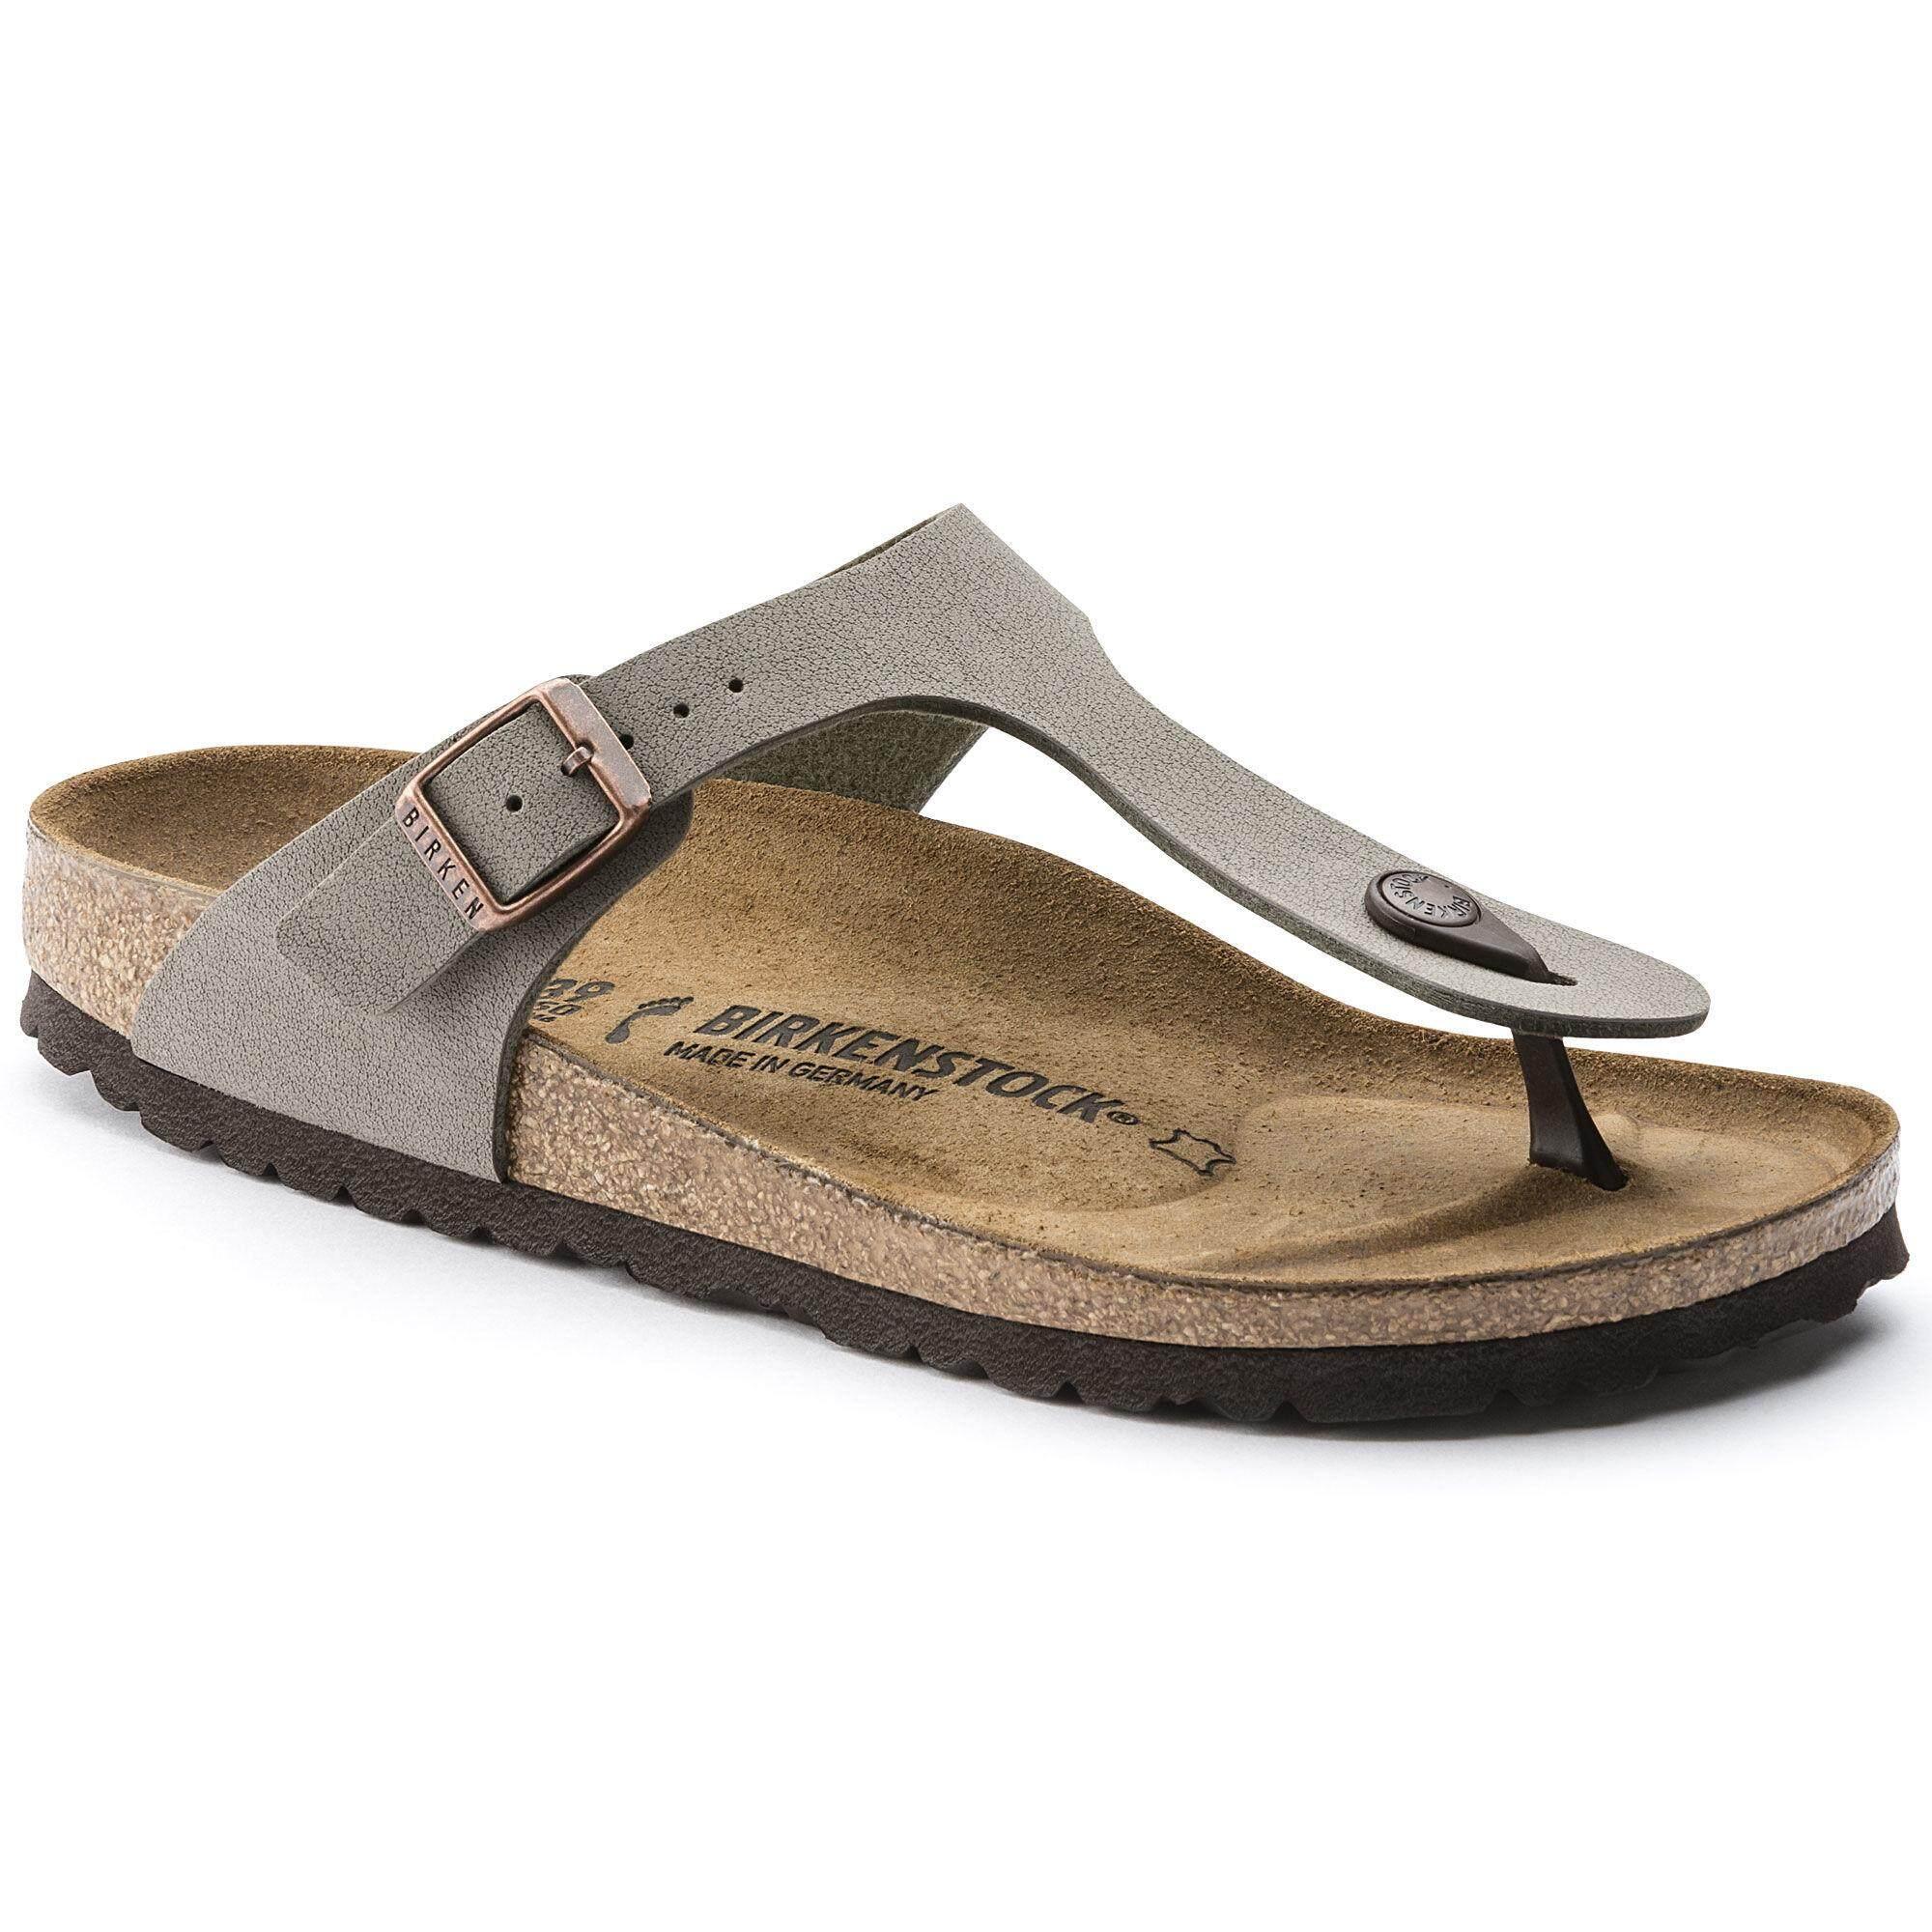 726b82049517 2019 Birkenstocks Women Sandals Women Thong Gizeh Birko-Flor Nubuck Stone  Hot